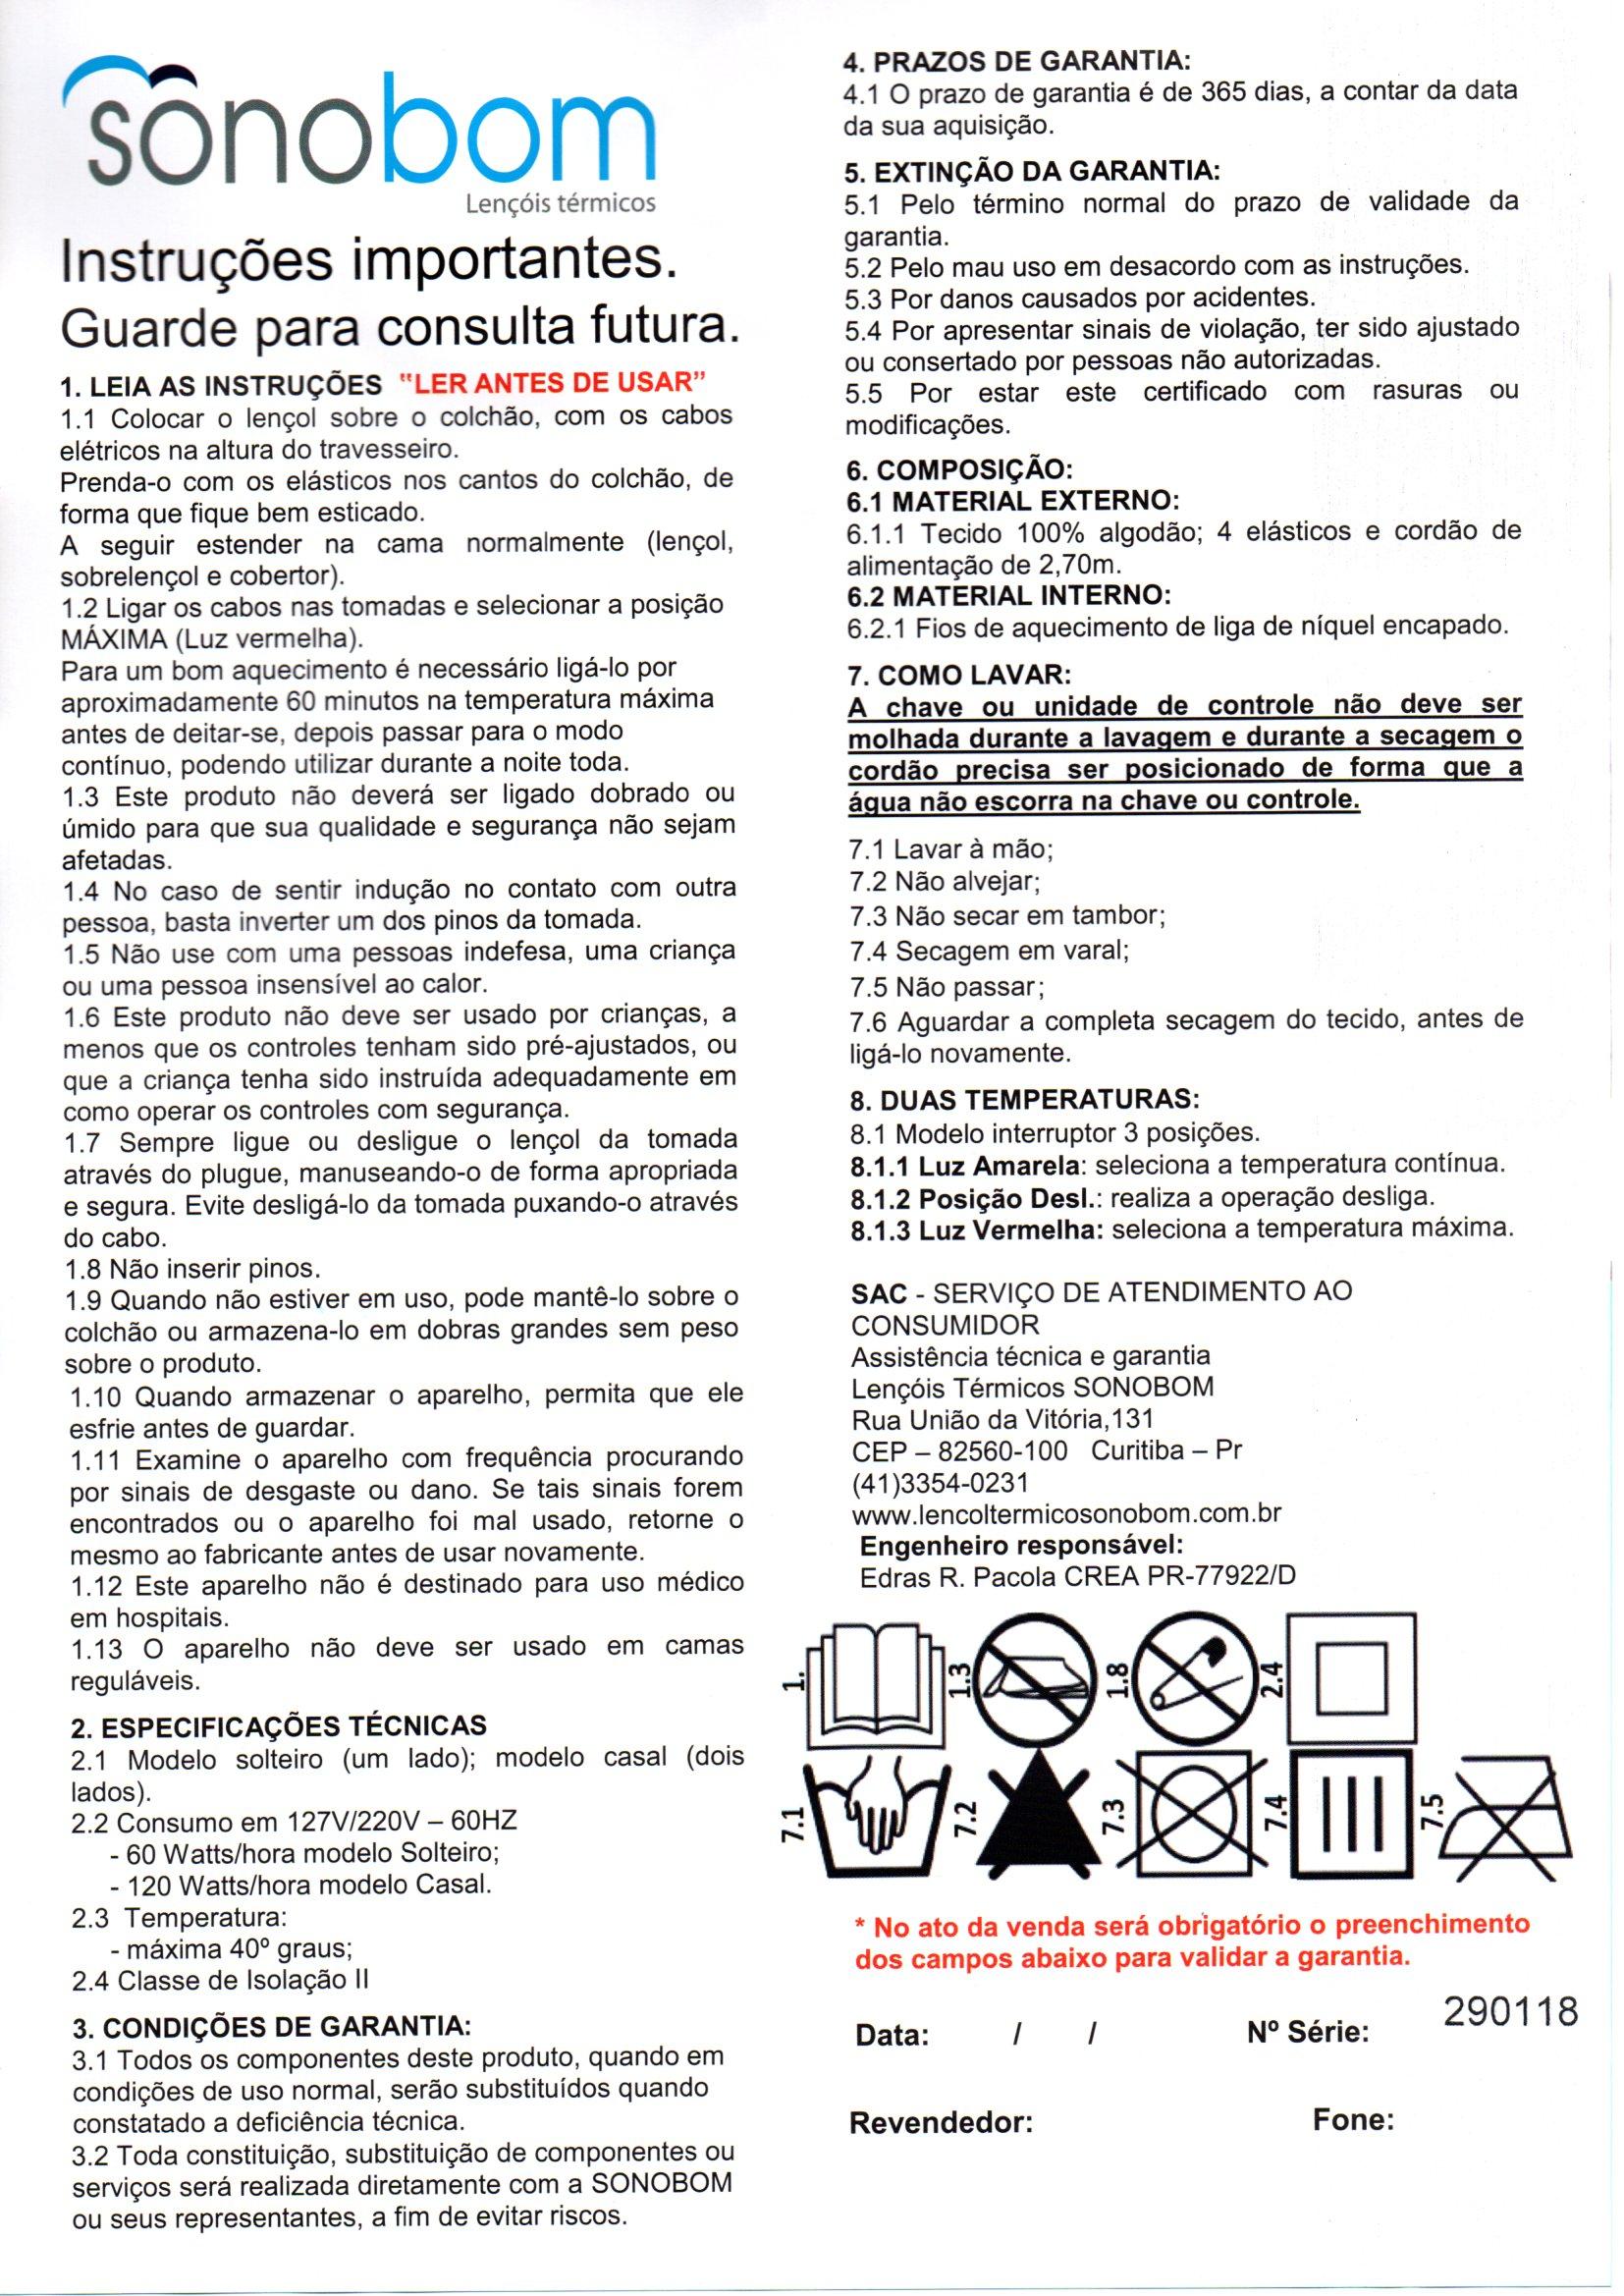 Polisani Materiais Médicos - LENCOL TERMICO CASAL 1,35X1,50  220V SONOBOM